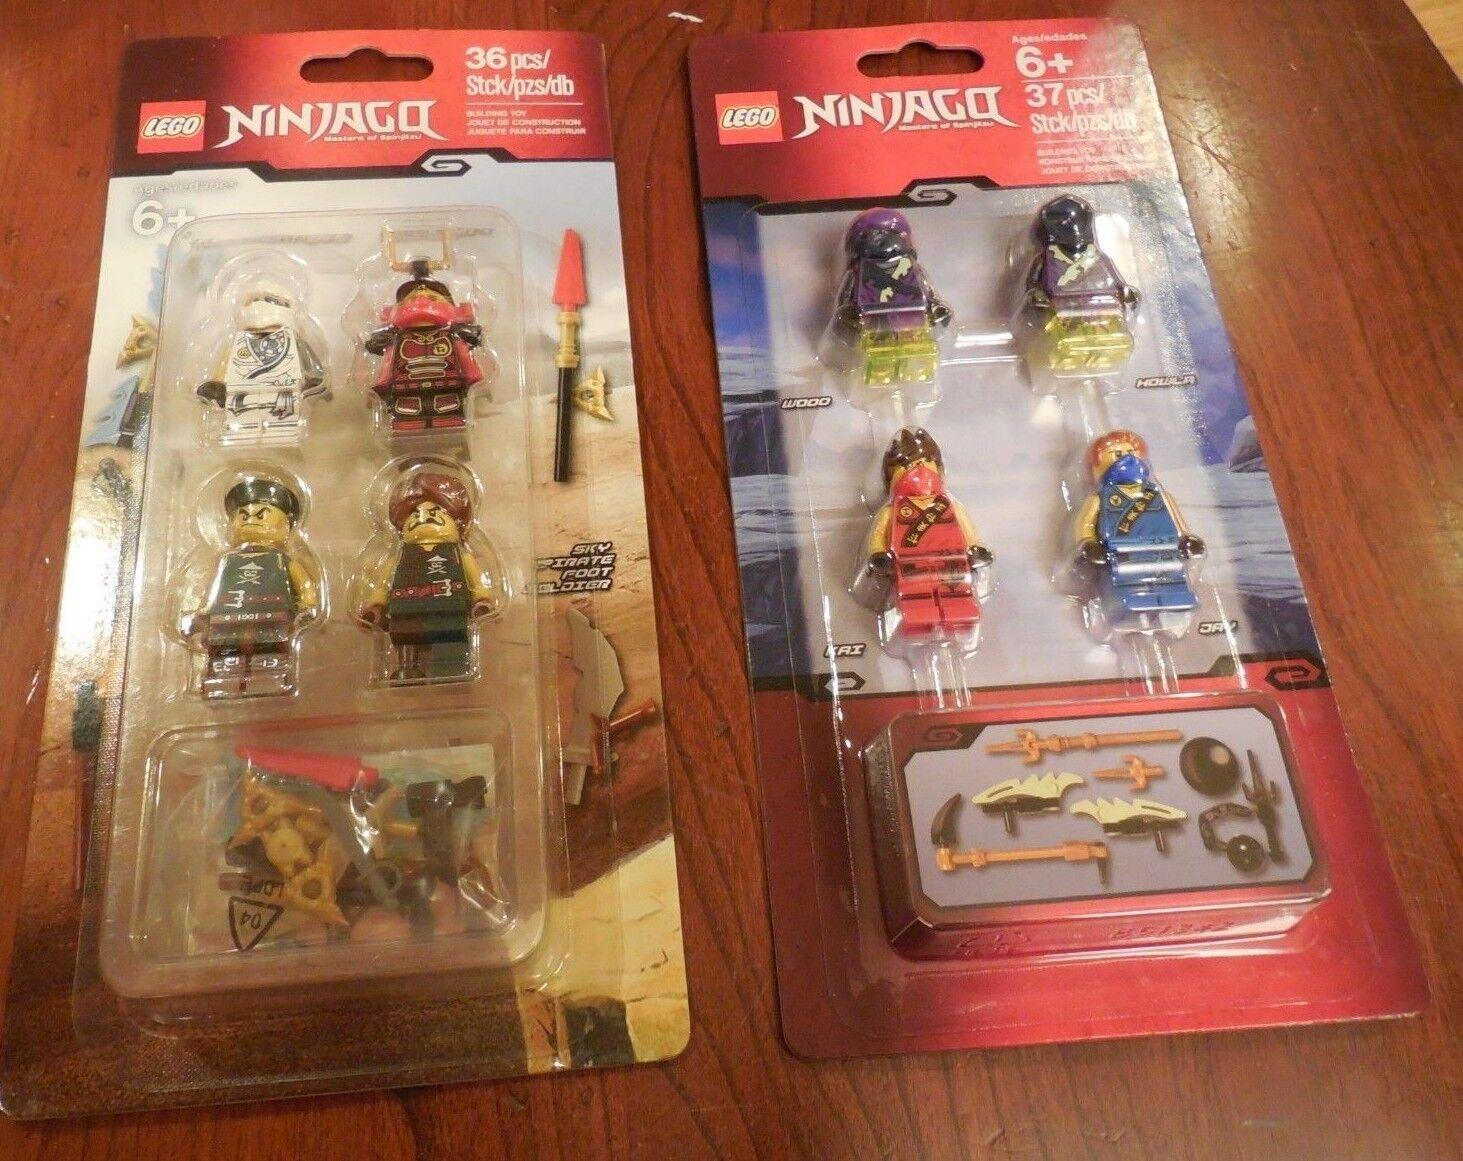 2-New LEGO Ninjago Minifigure Sets Masters of Spinjitzu 851342 & & & 853544 8 MINIS 64cc76